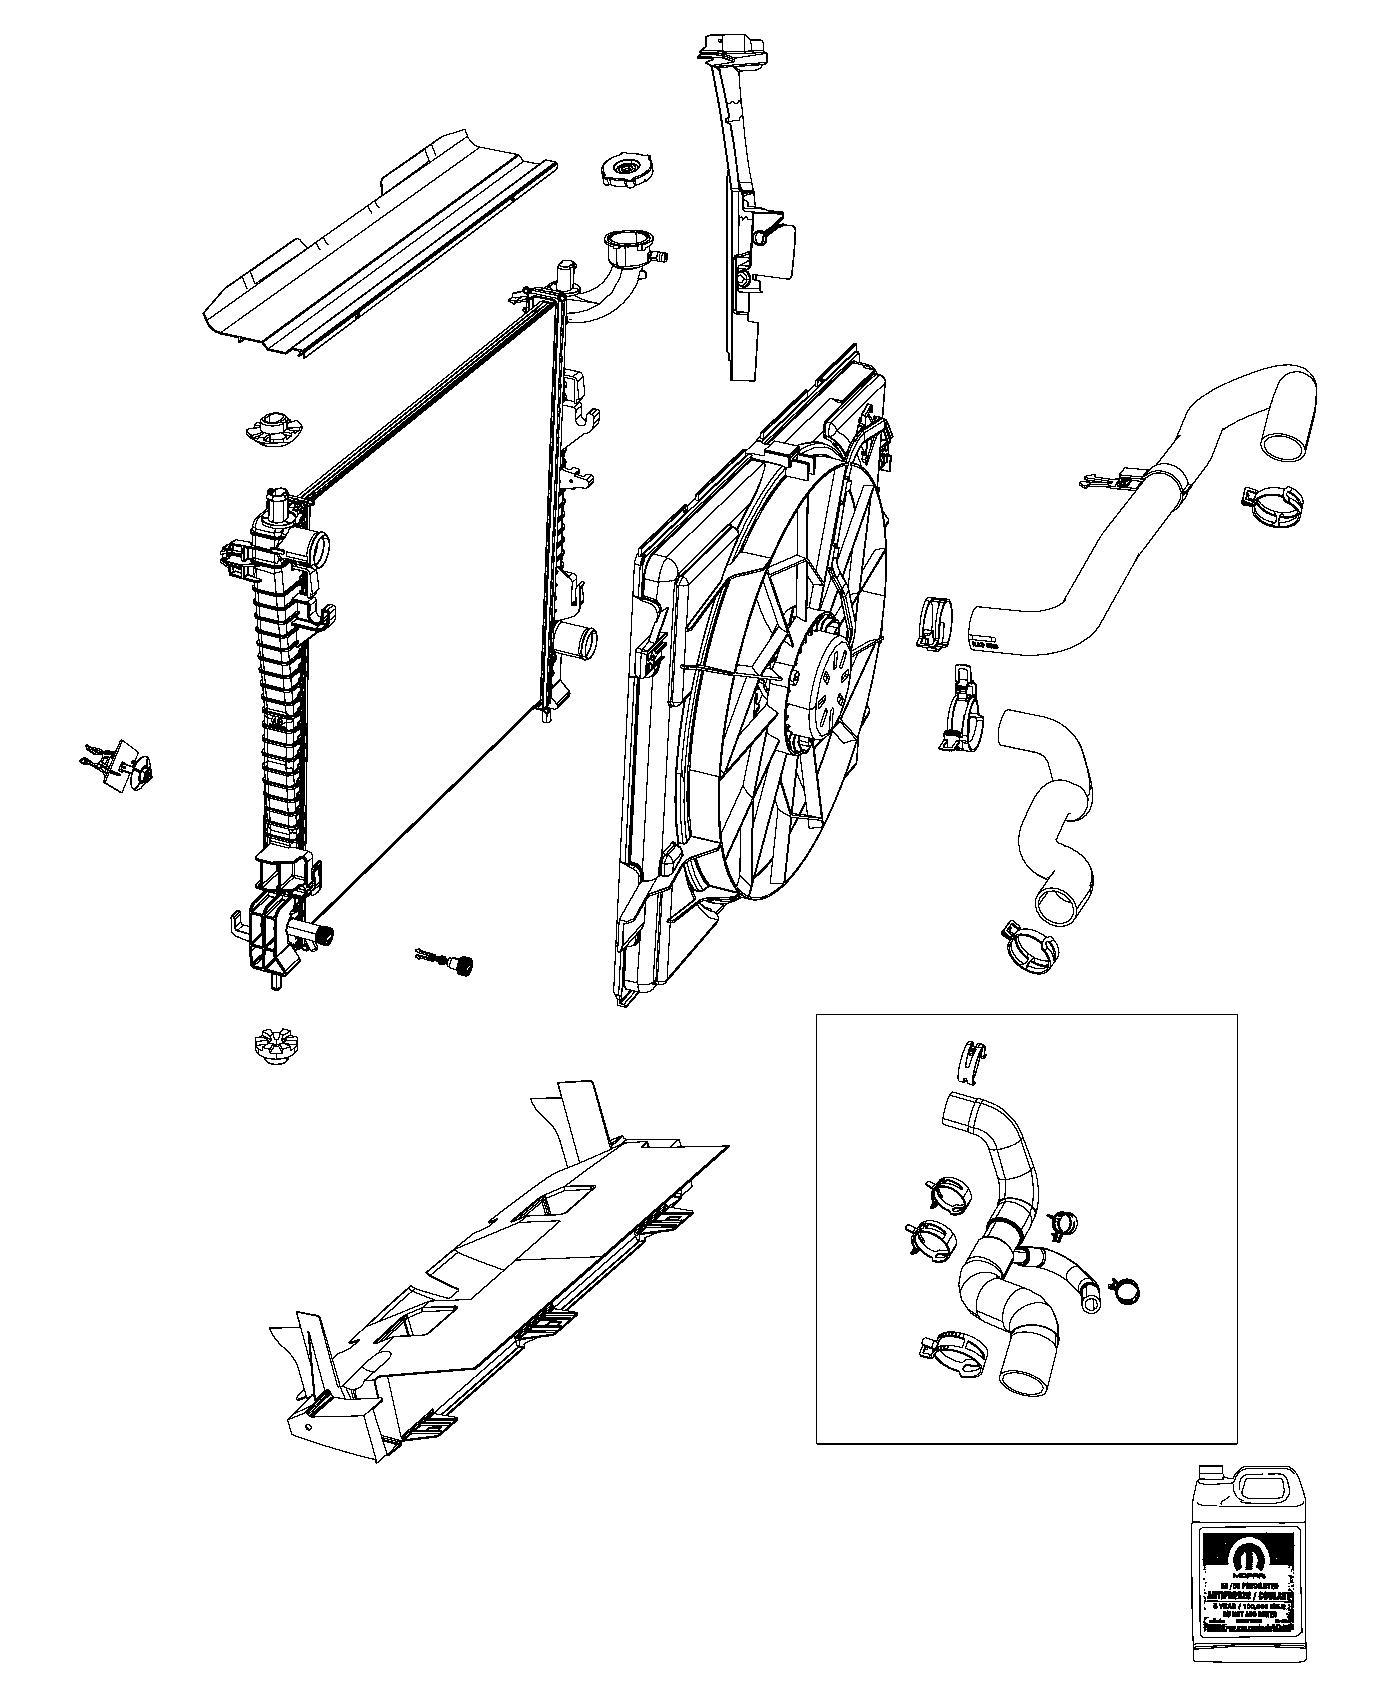 Jeep Wrangler Wiring Schematic